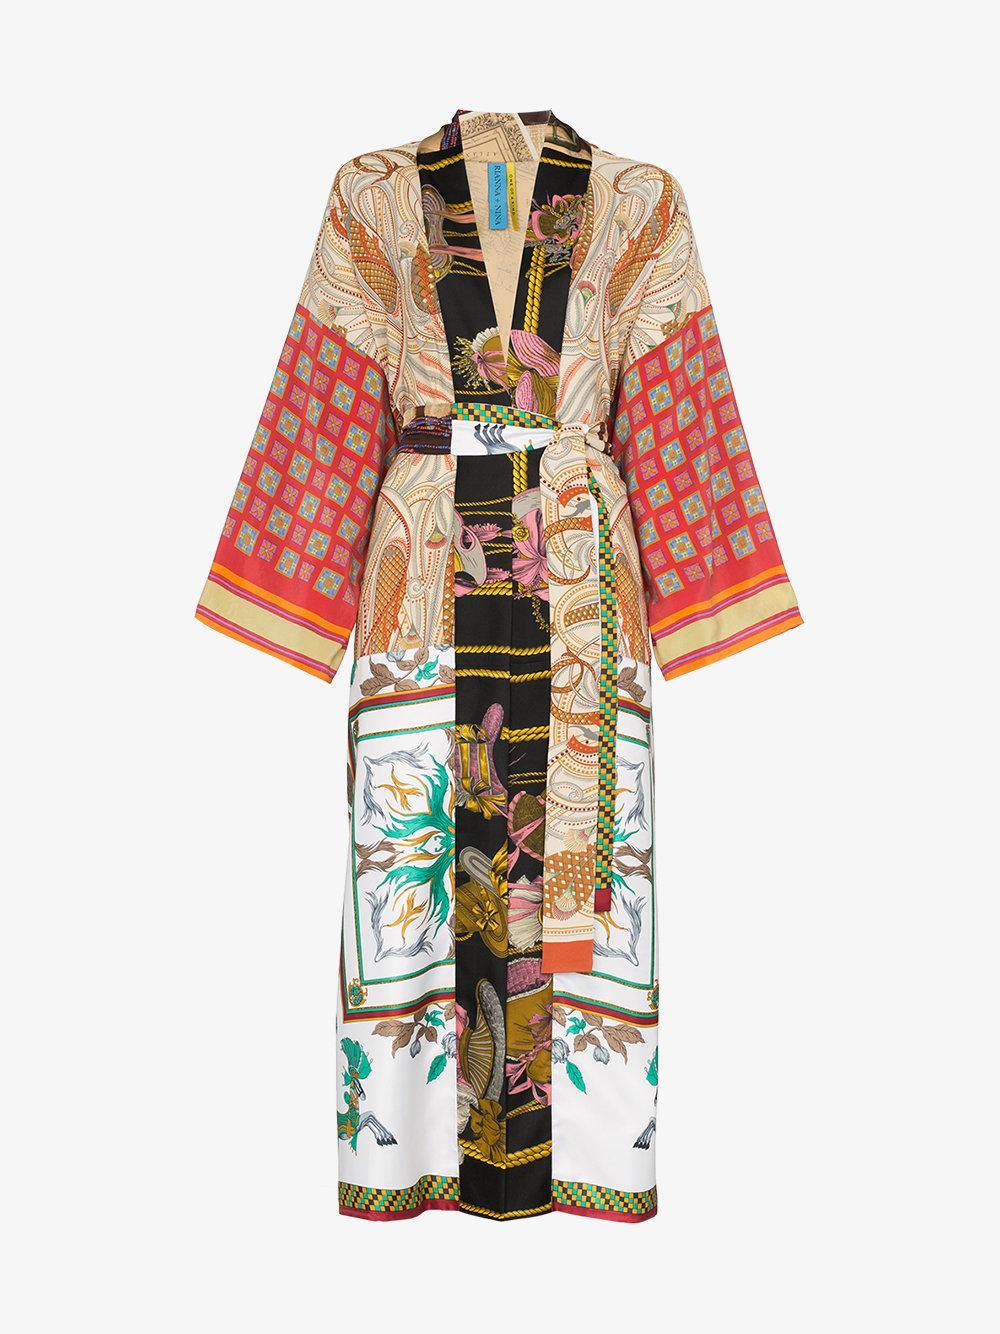 d97bf0e6f8 Lyst - Rianna + Nina Long Multi Floral Square Print Silk Kimono Robe